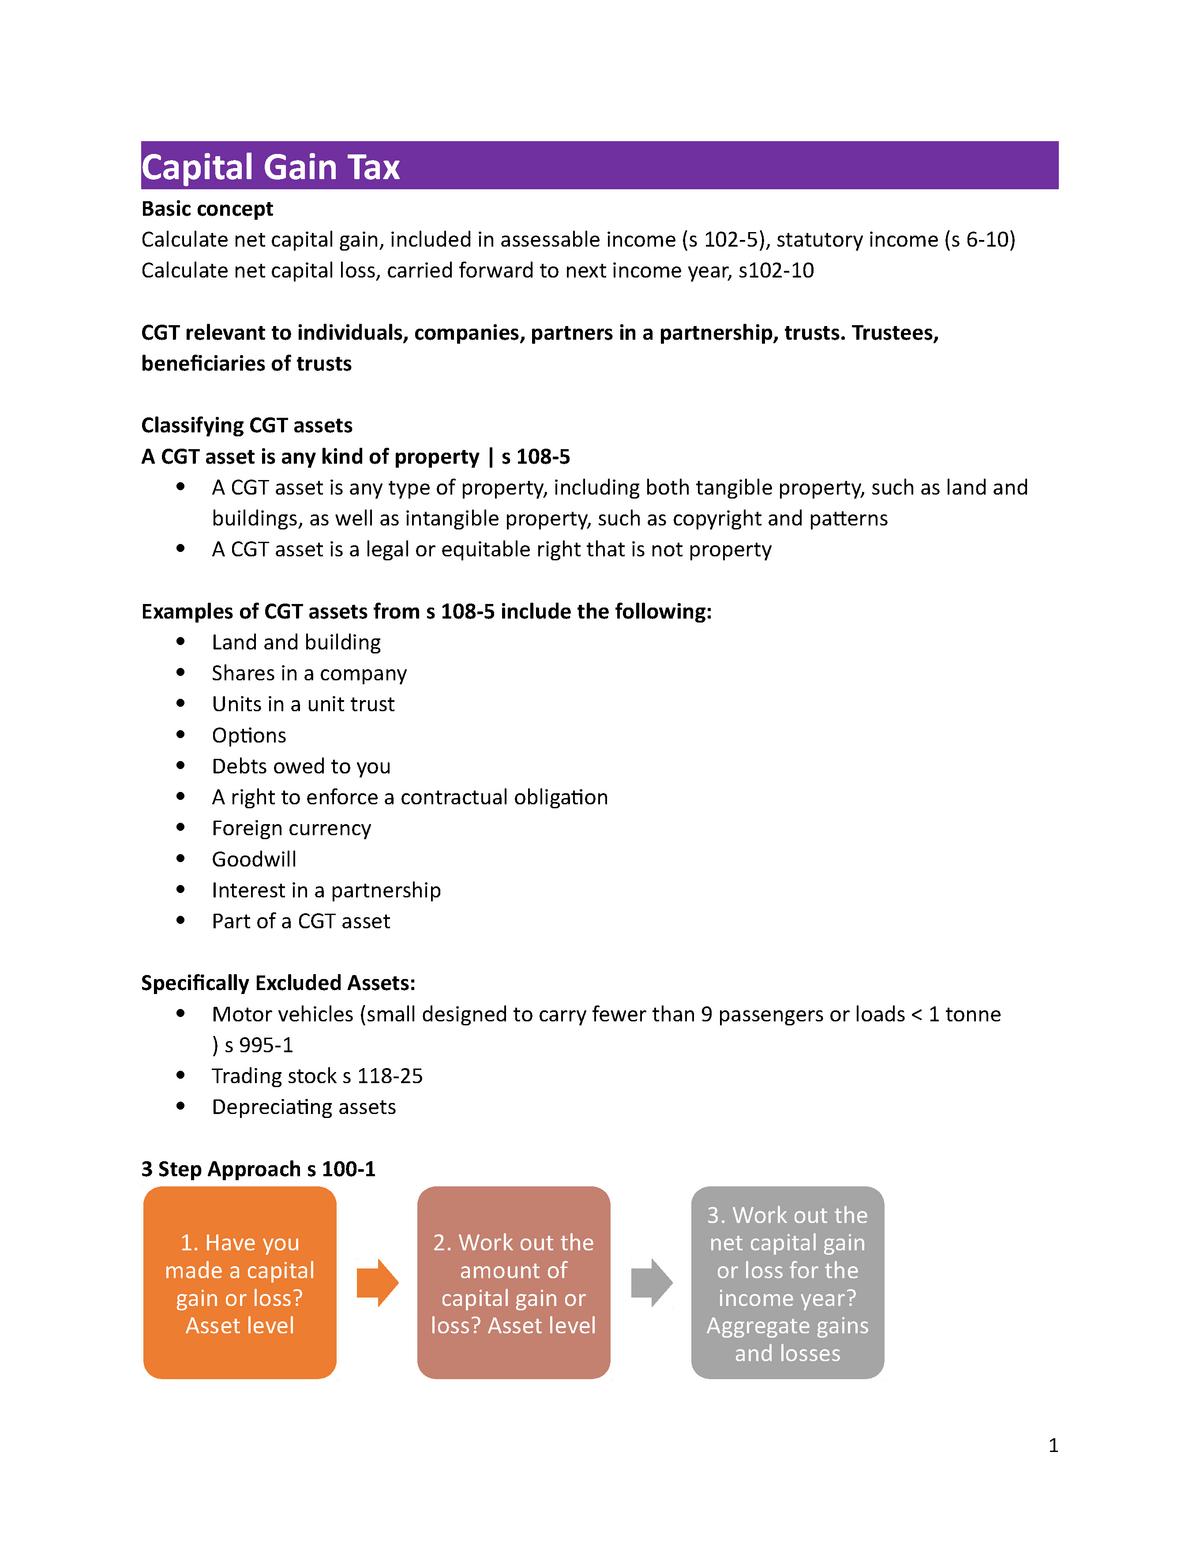 Capital Gain Tax - Summary Income Tax Law - LAWS3101 - StuDocu